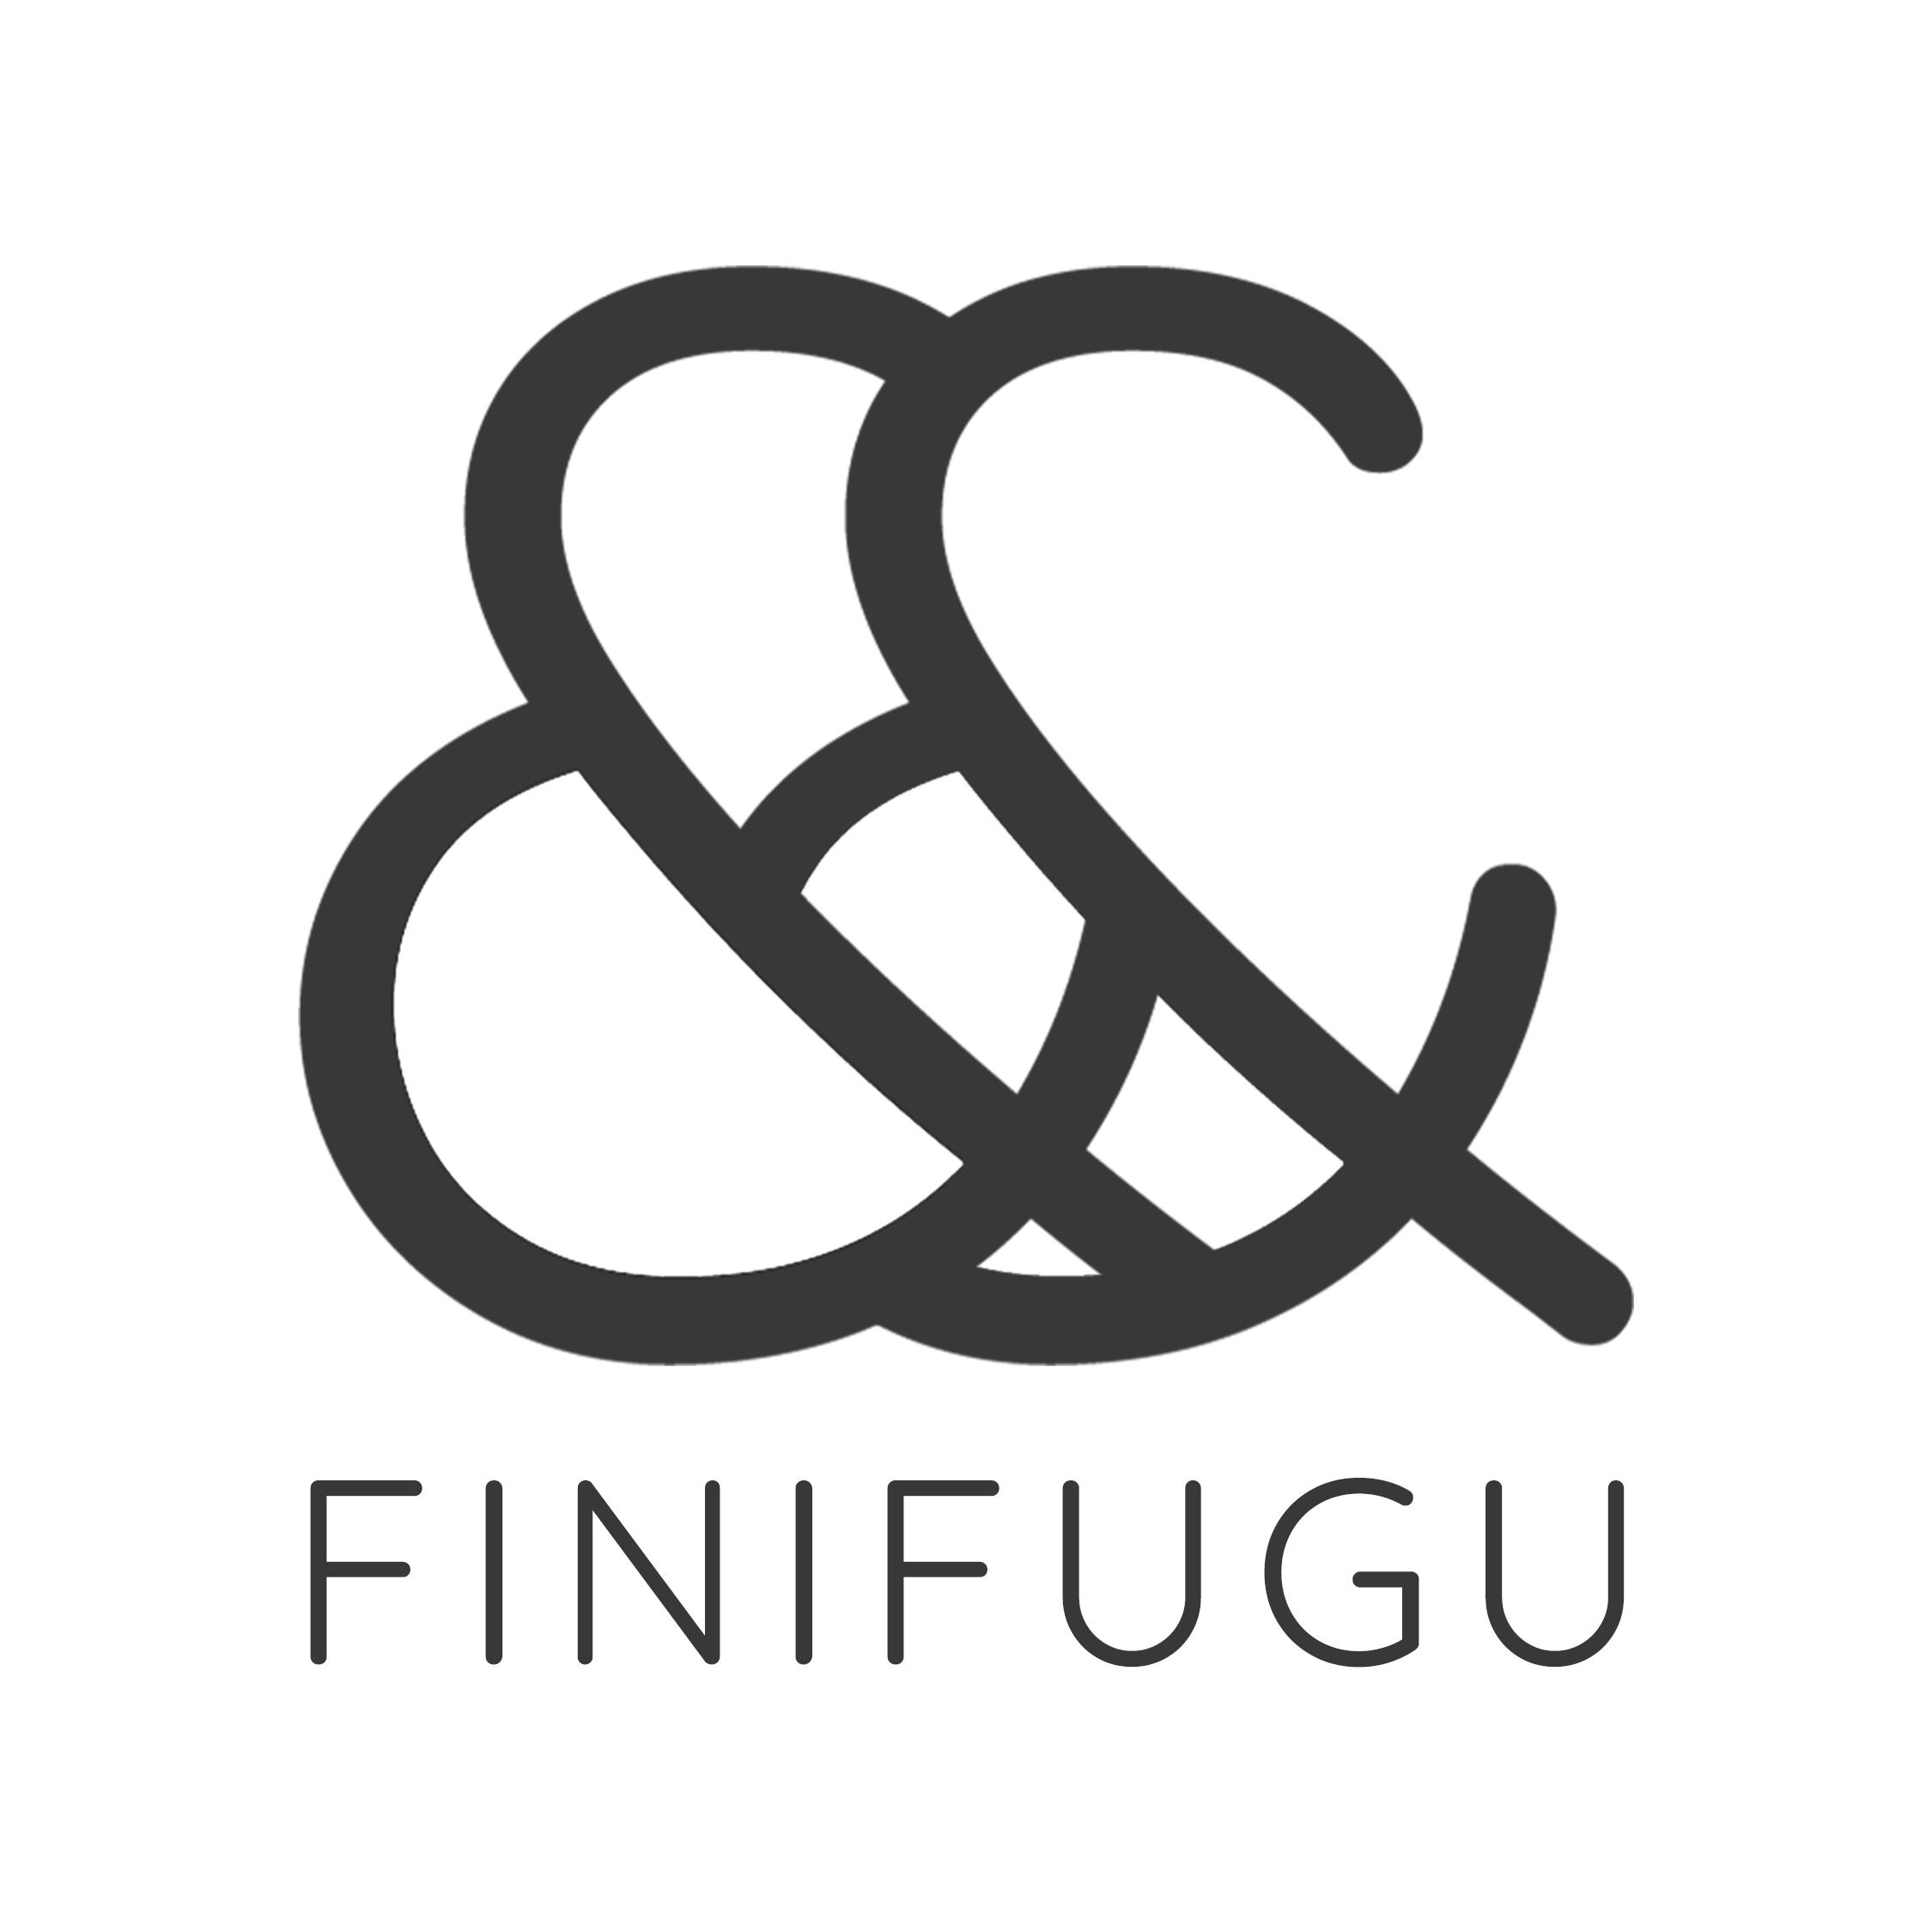 FINIFUGUlogo.jpg